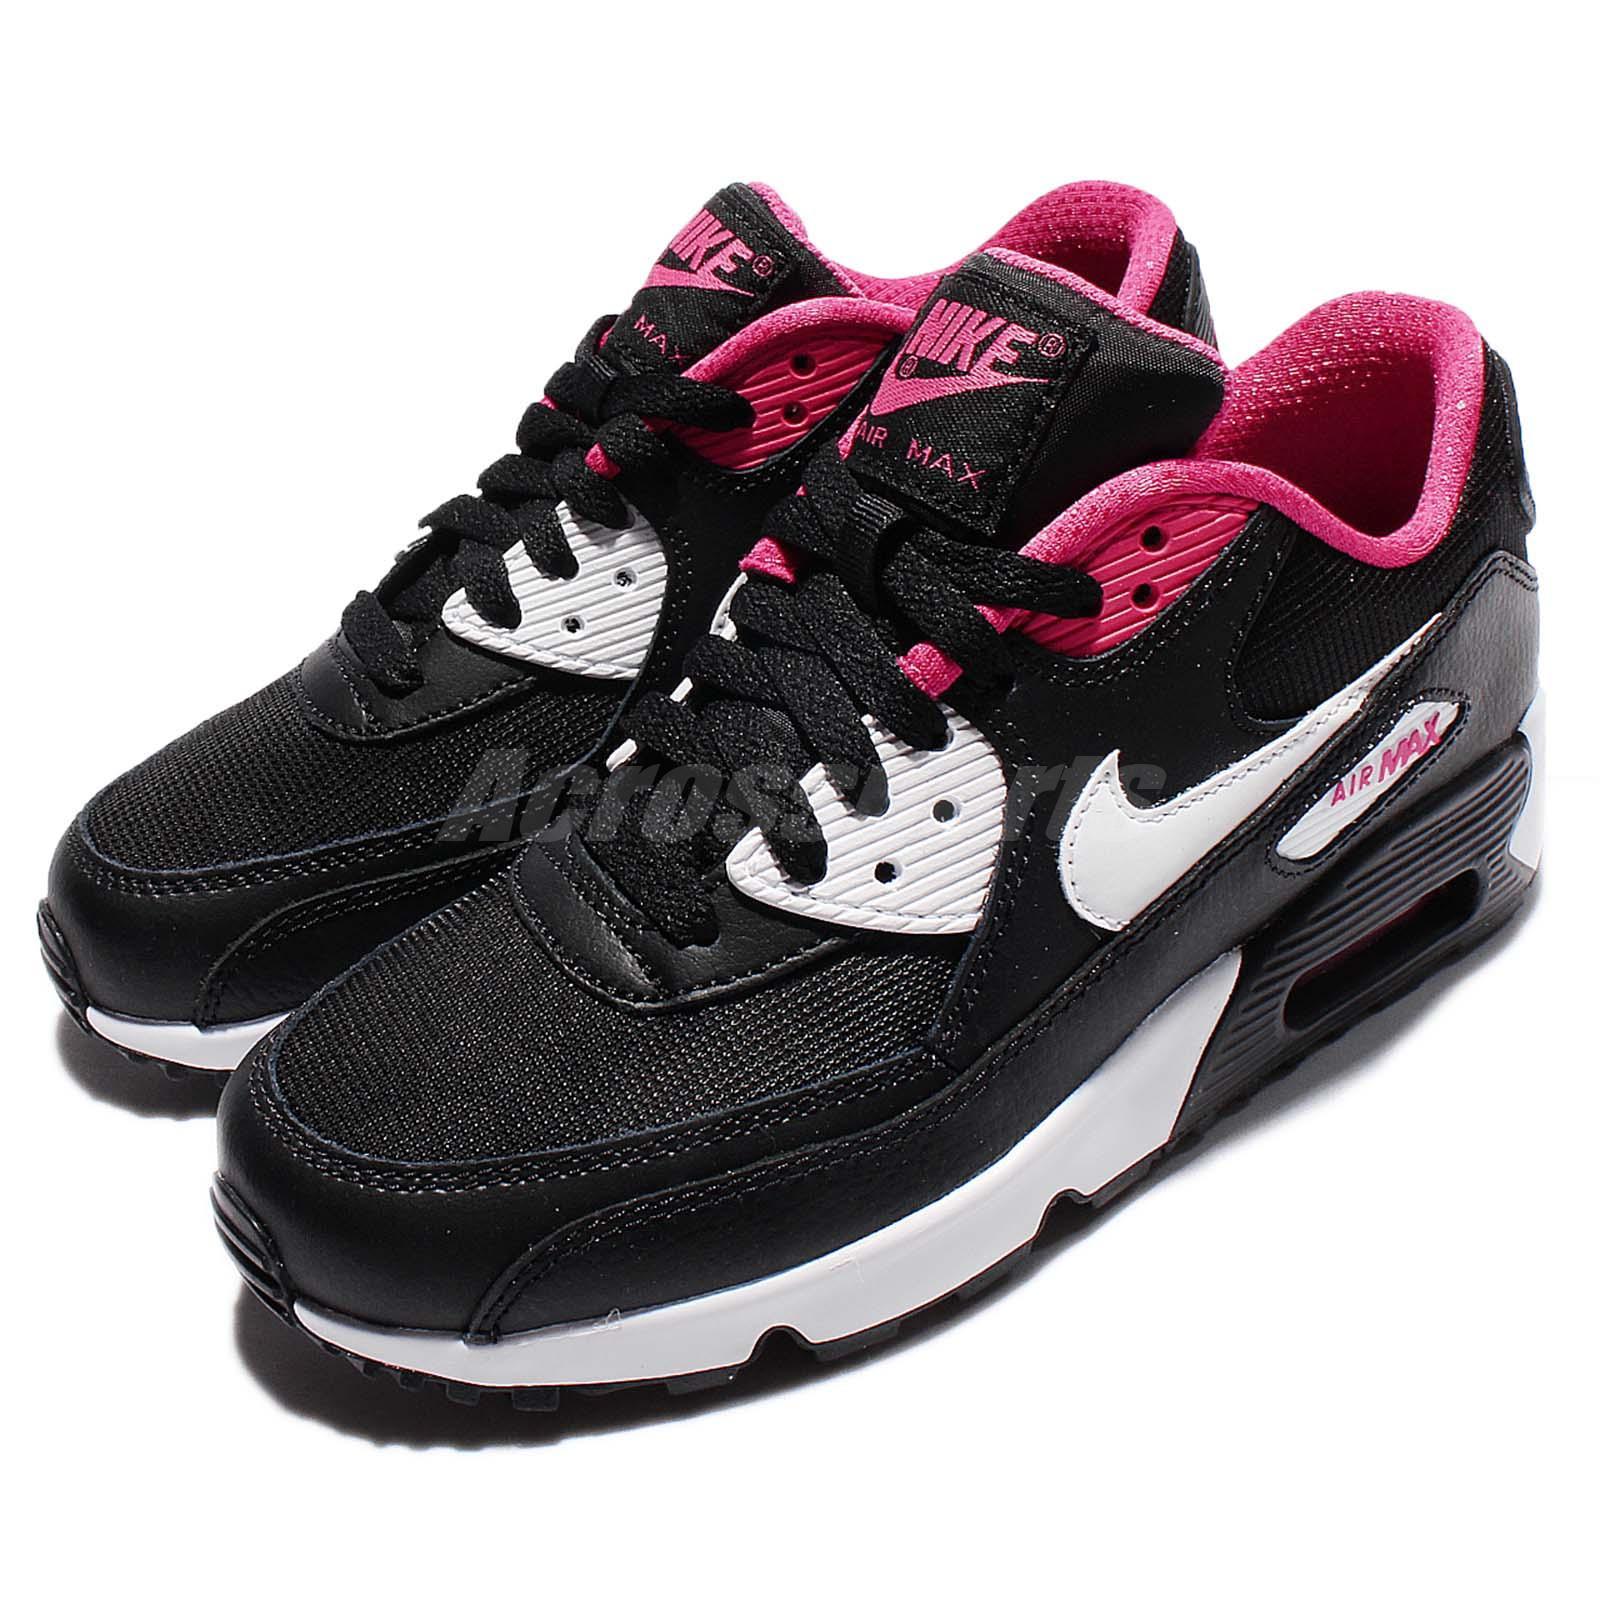 nike air max 90 mesh gs black pink kids women running. Black Bedroom Furniture Sets. Home Design Ideas